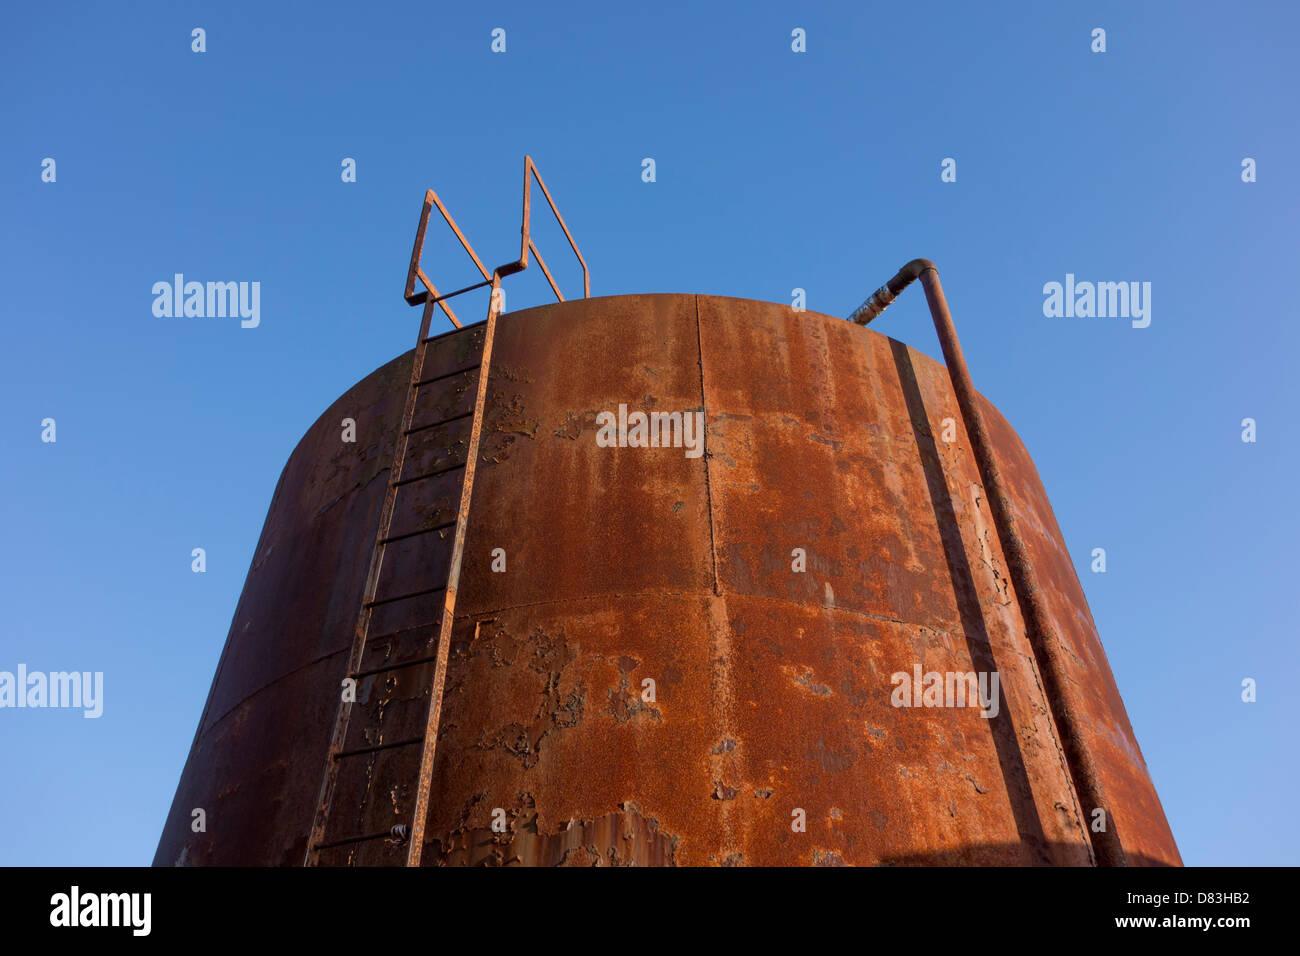 Old rusty water storage tank Stock Photo: 56627846 - Alamy